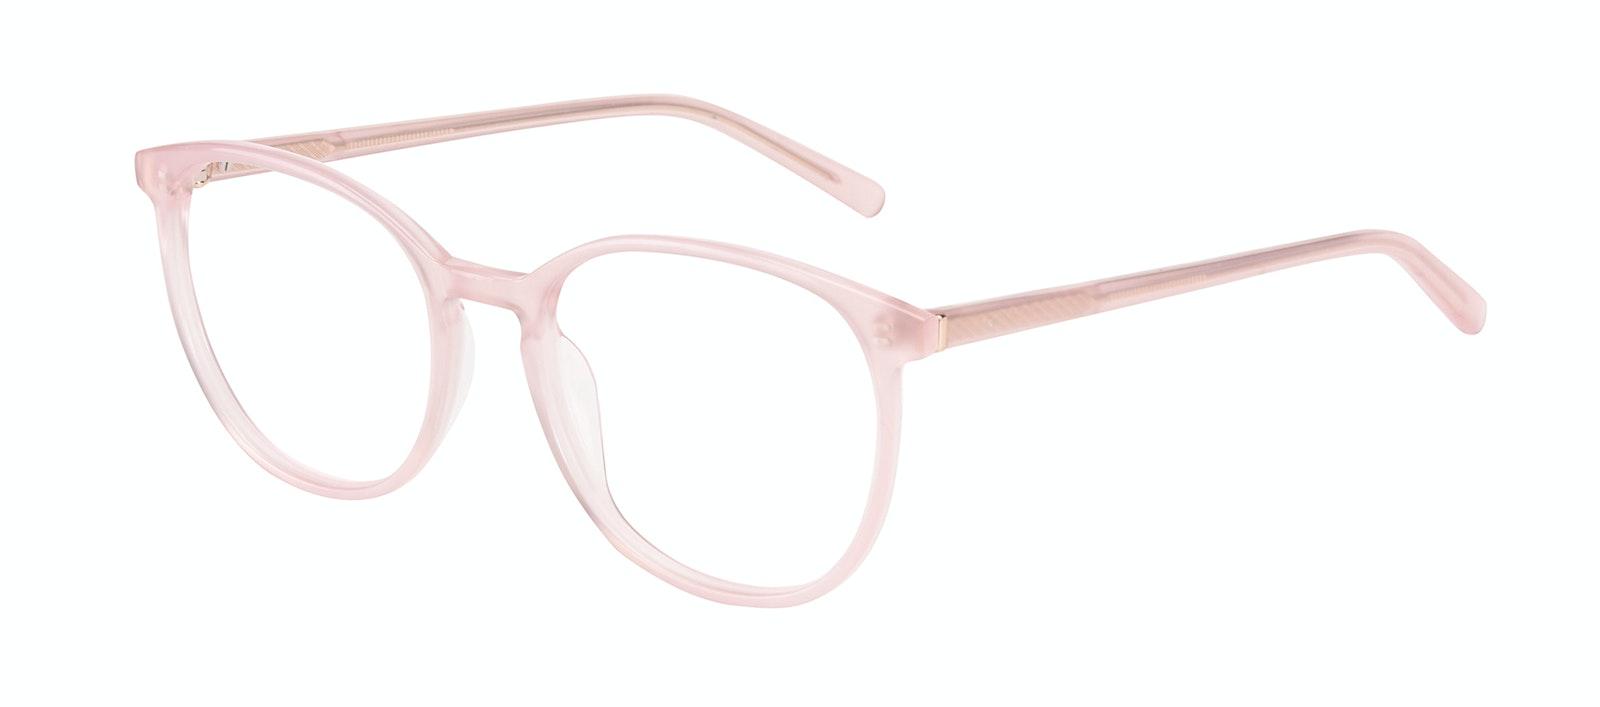 Affordable Fashion Glasses Round Eyeglasses Women Femme Libre Mila Tilt